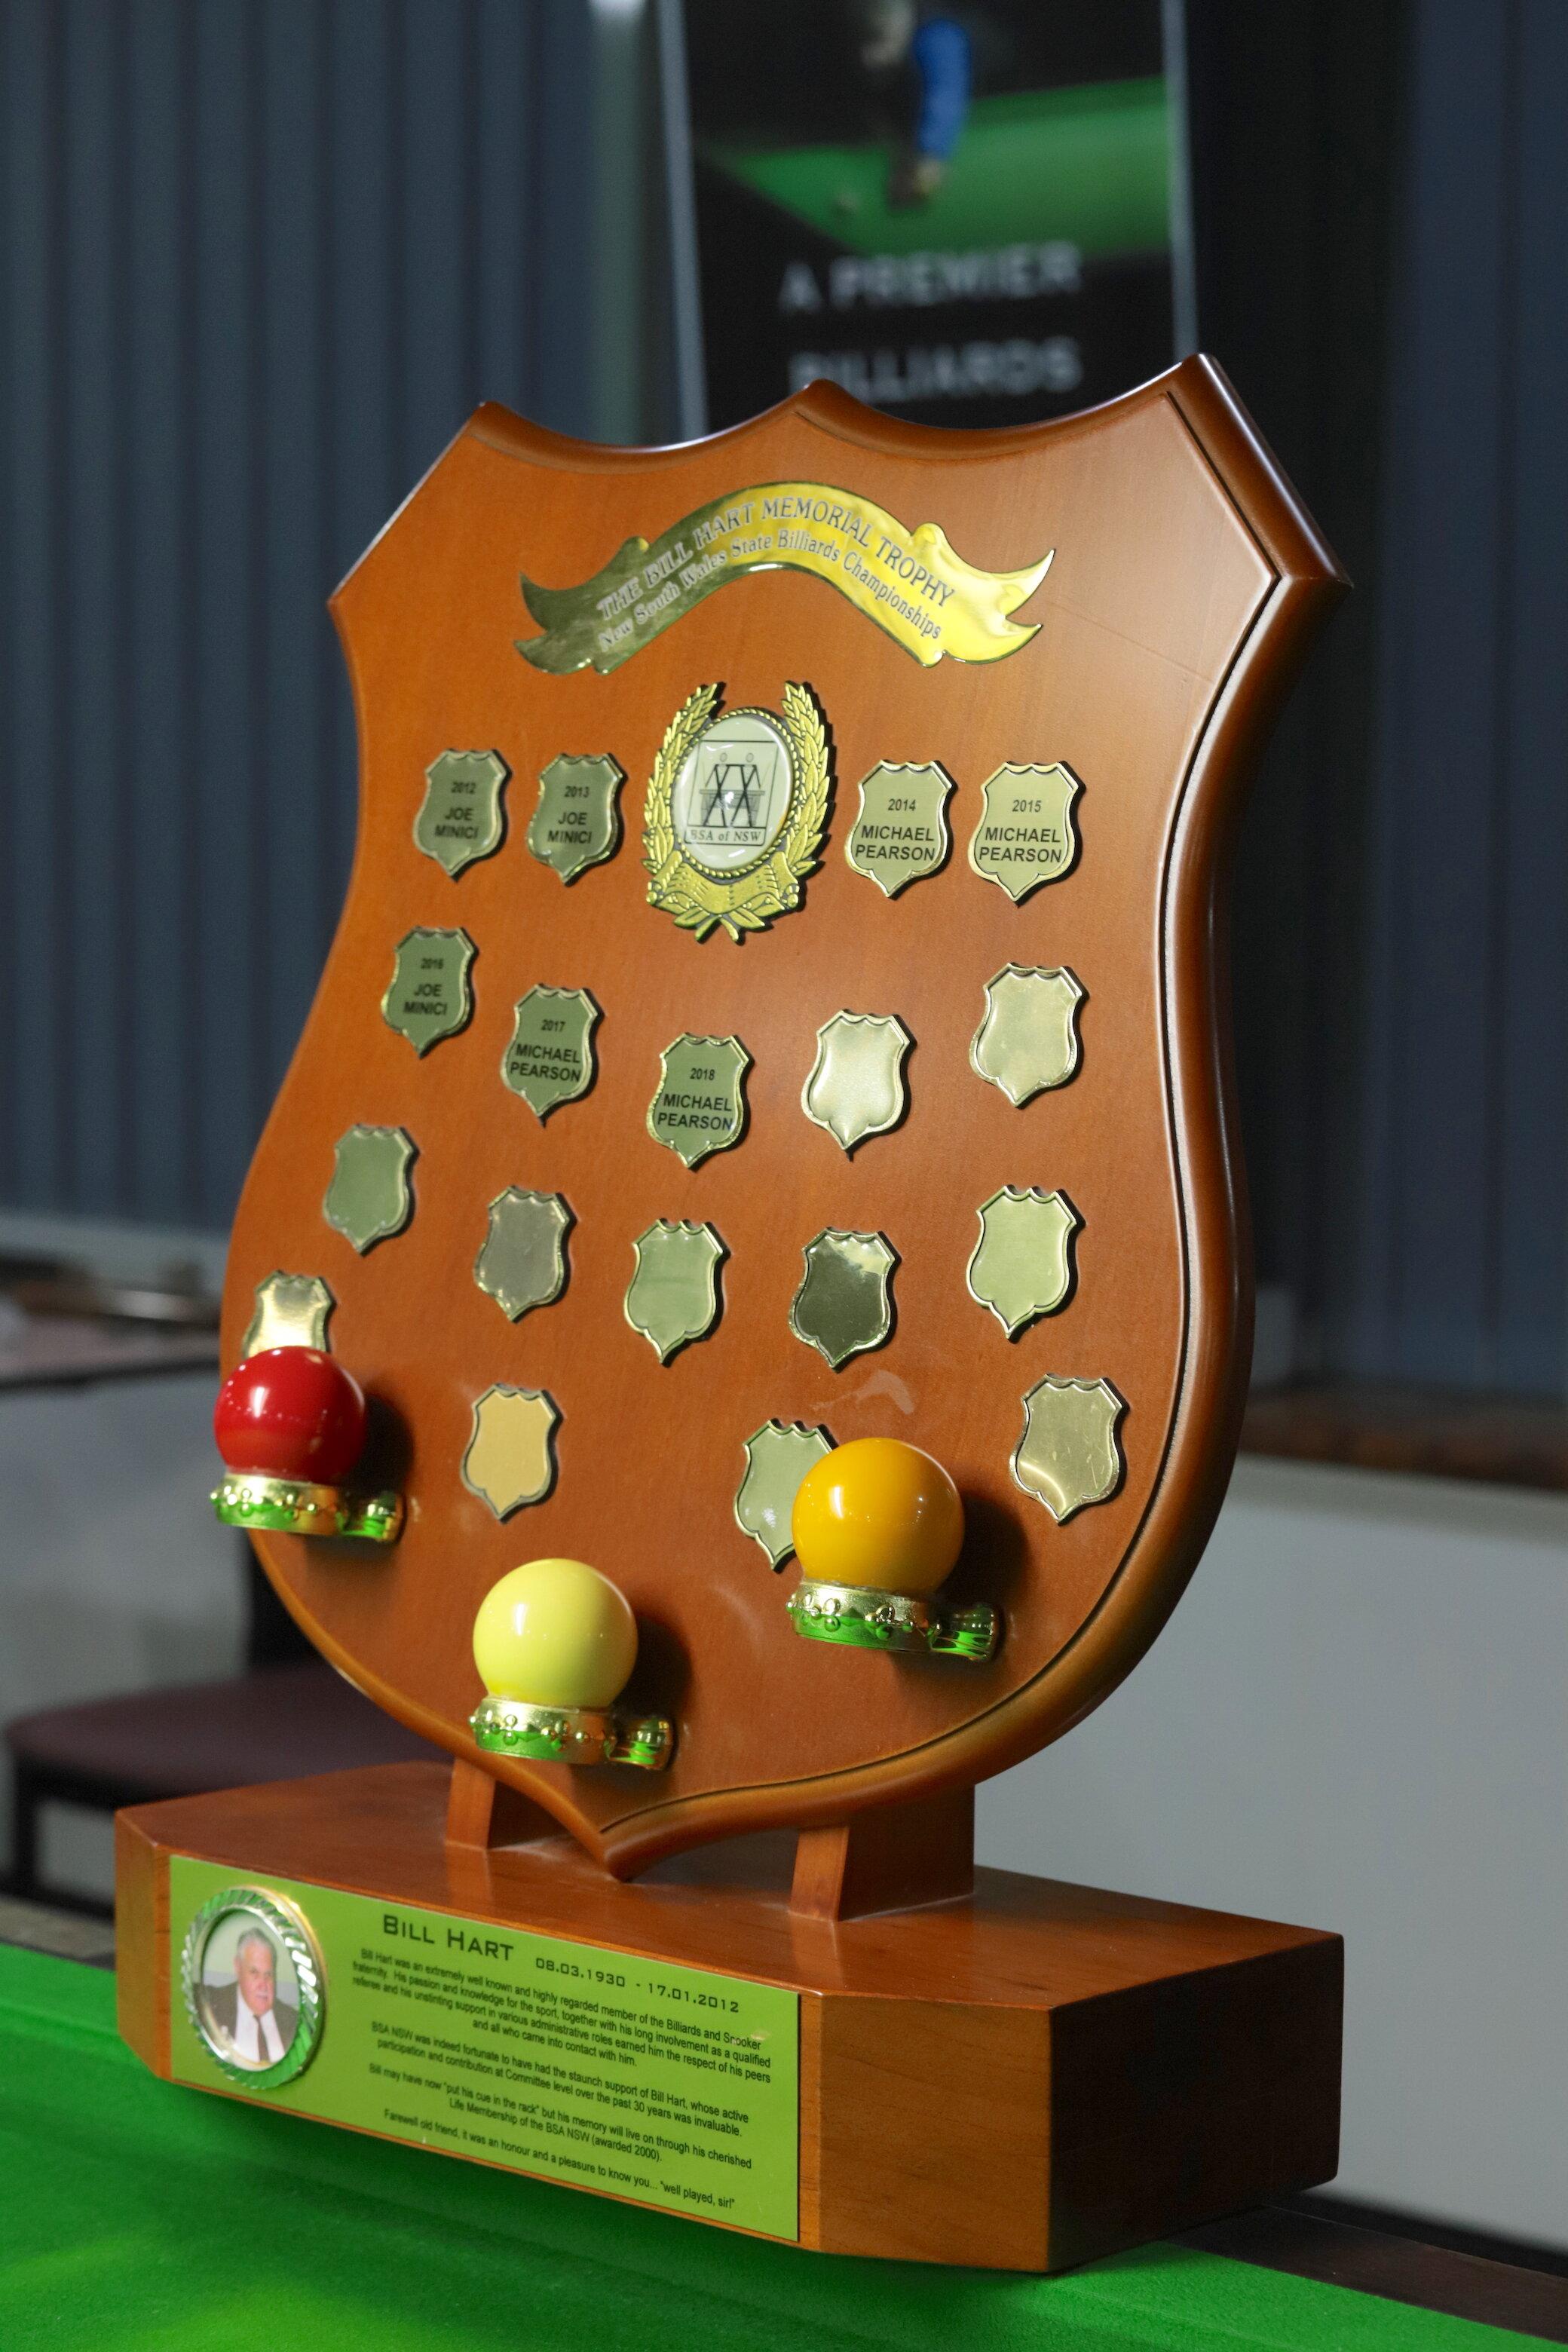 The NSW State Billiards Shield2.JPG